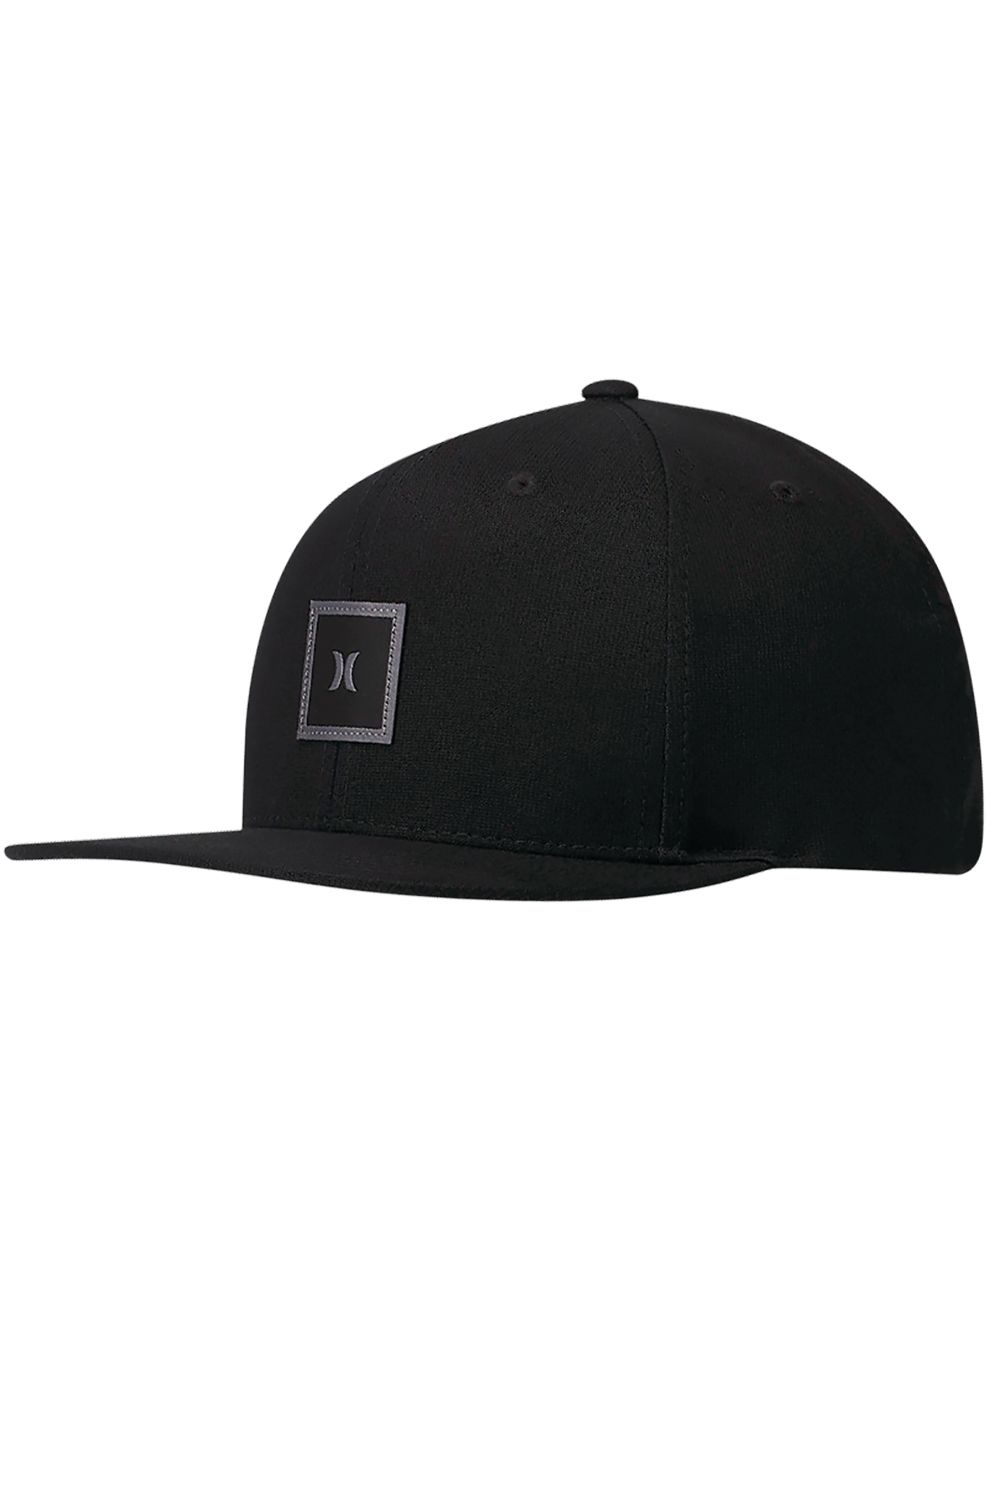 Hurley Cap   STORM ICON FLAT Black